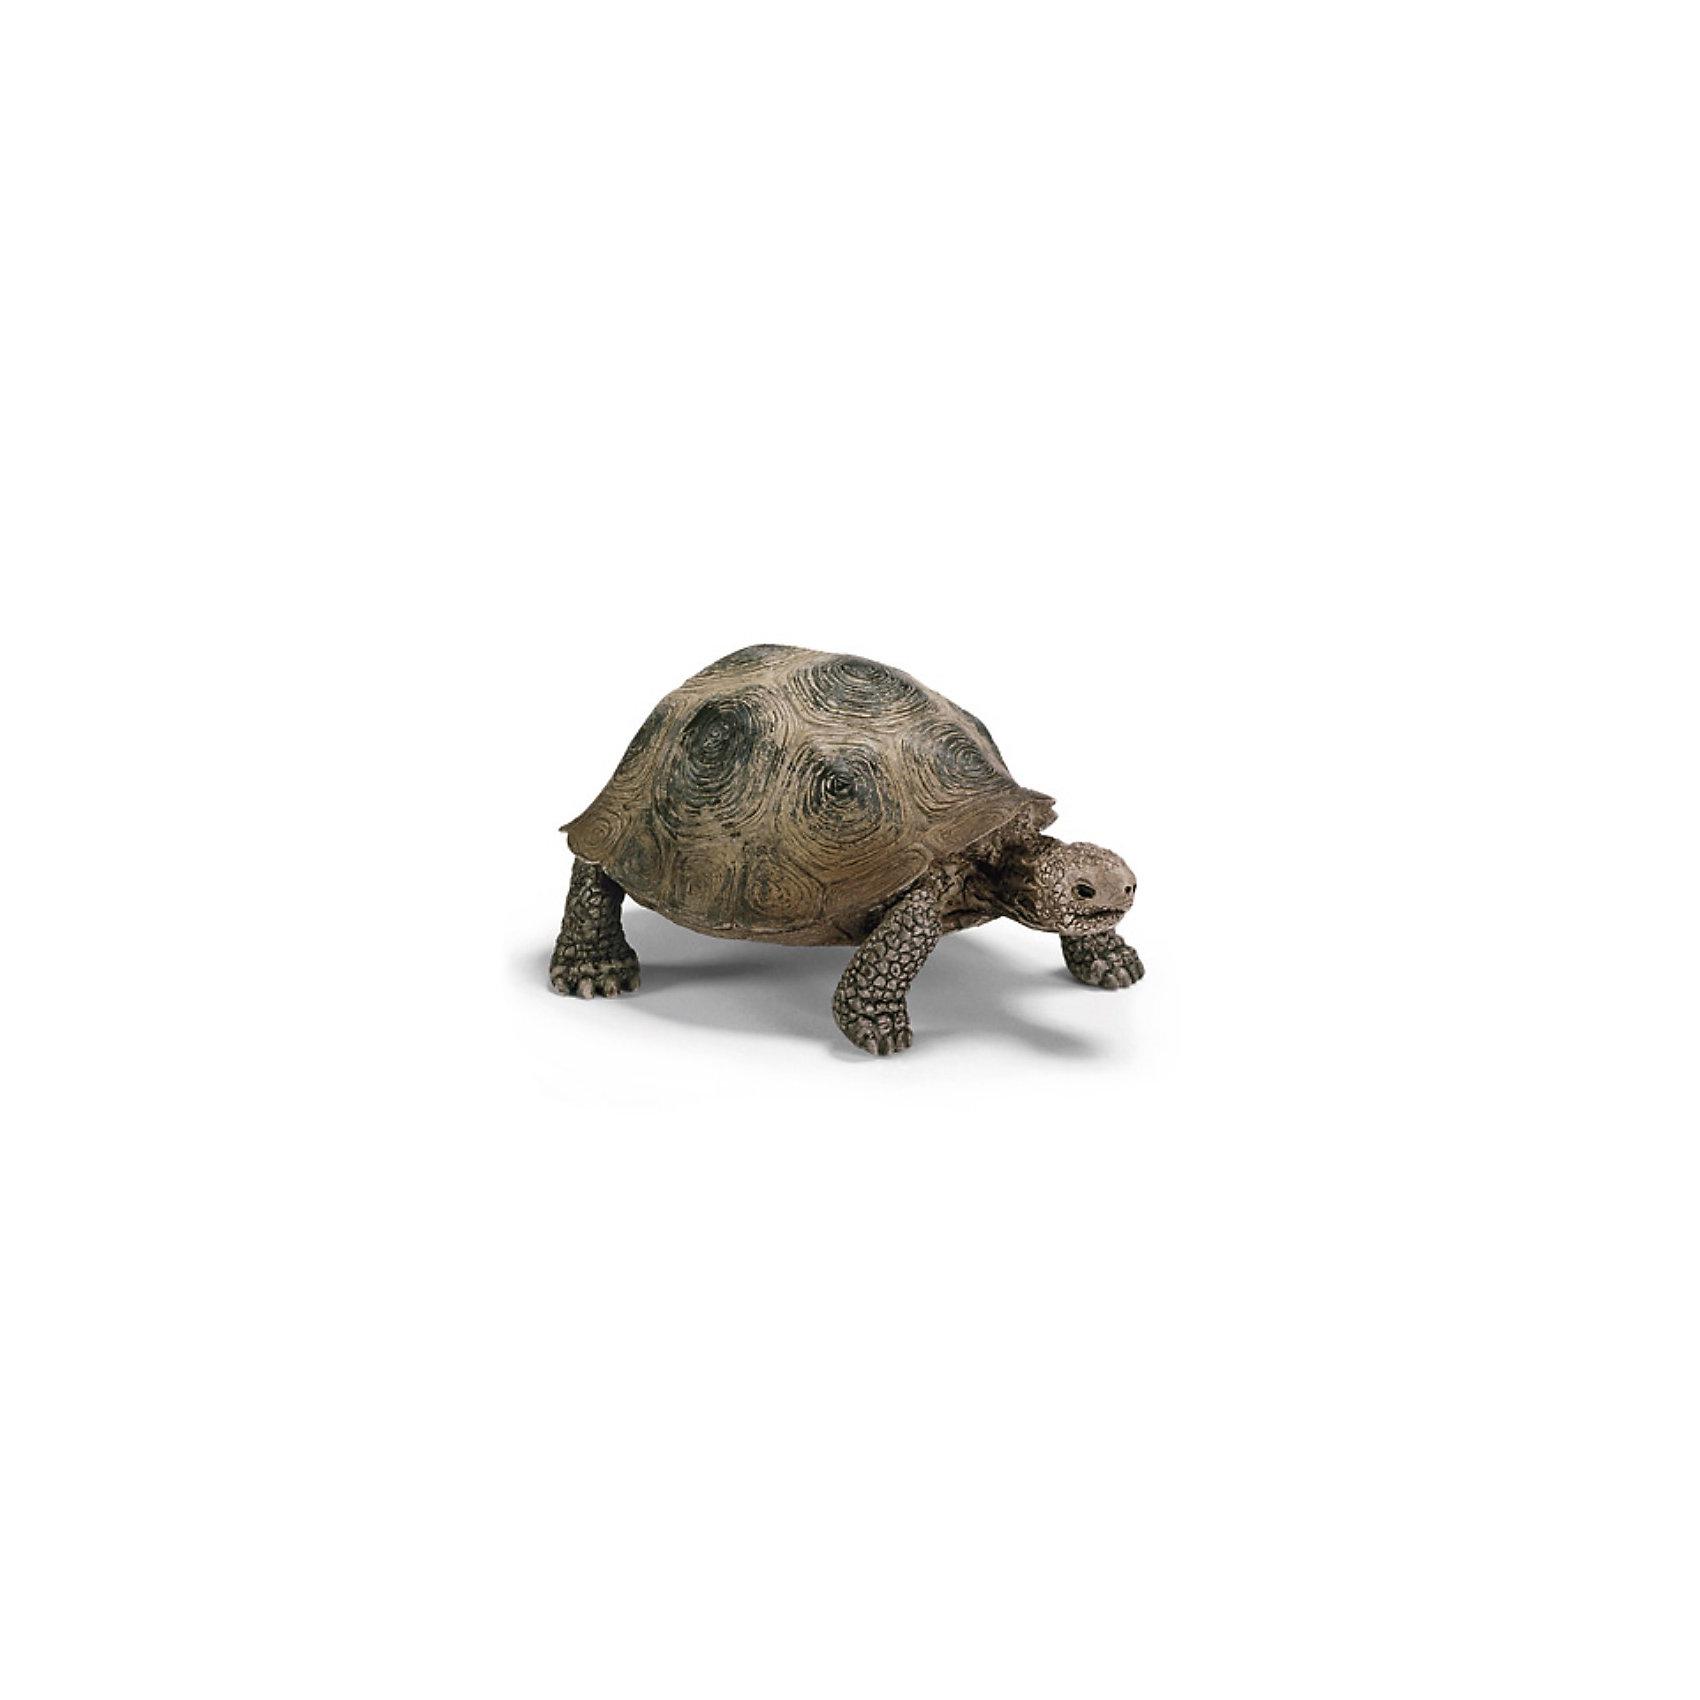 Schleich Гигантская черепаха. Серия Дикие животные